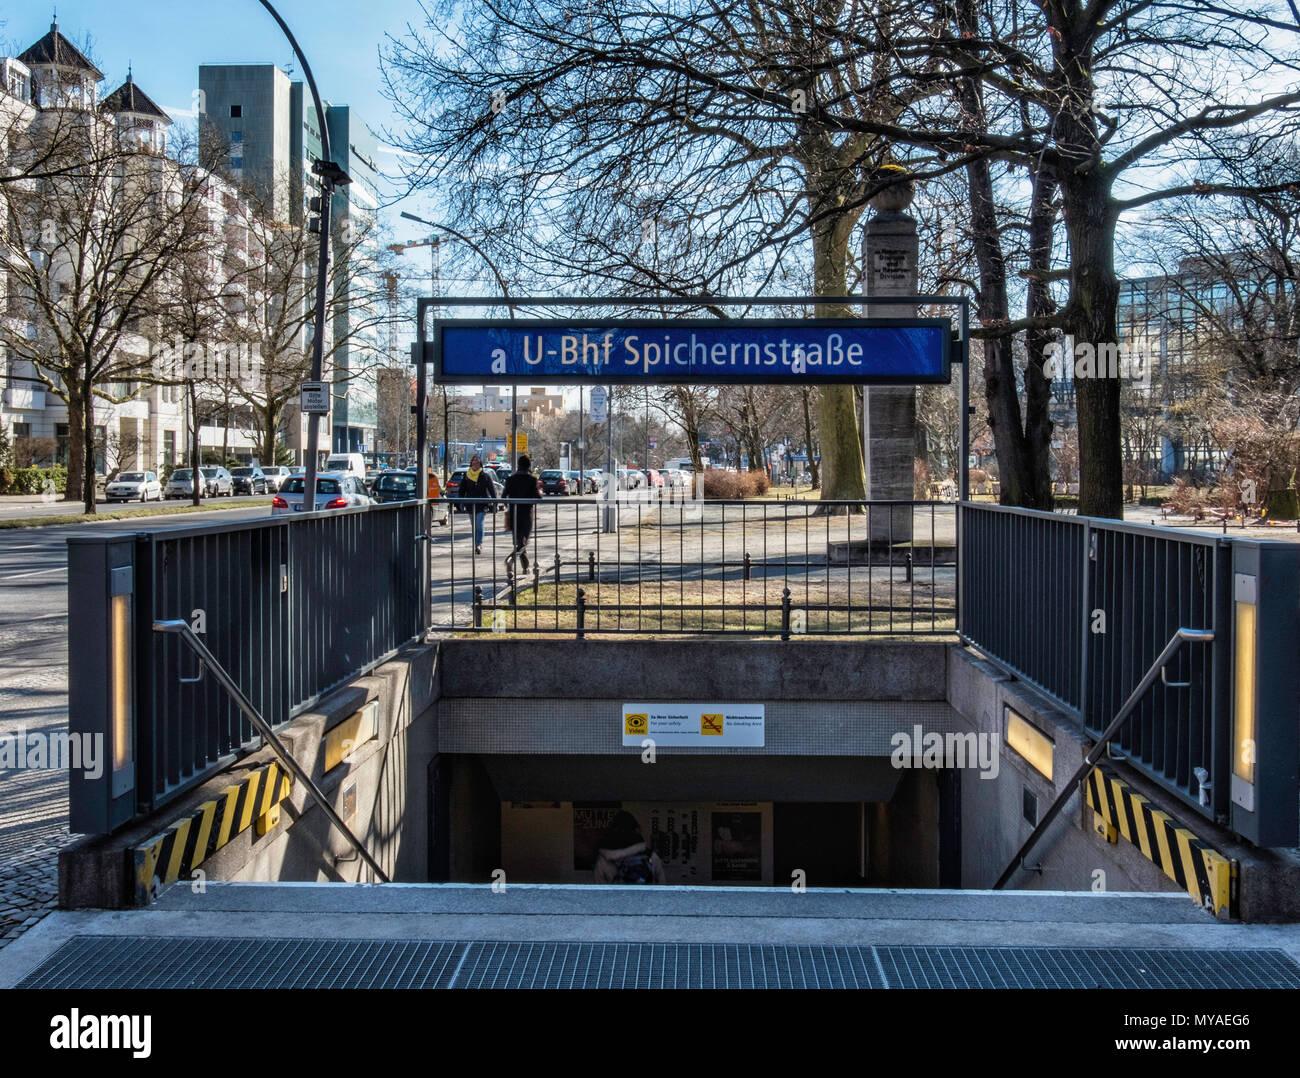 Berlin Wilmersdorf. Spichernstraße U-Bahn underground railway station serves U 3 and U 9 lines.Street view of entrance - Stock Image